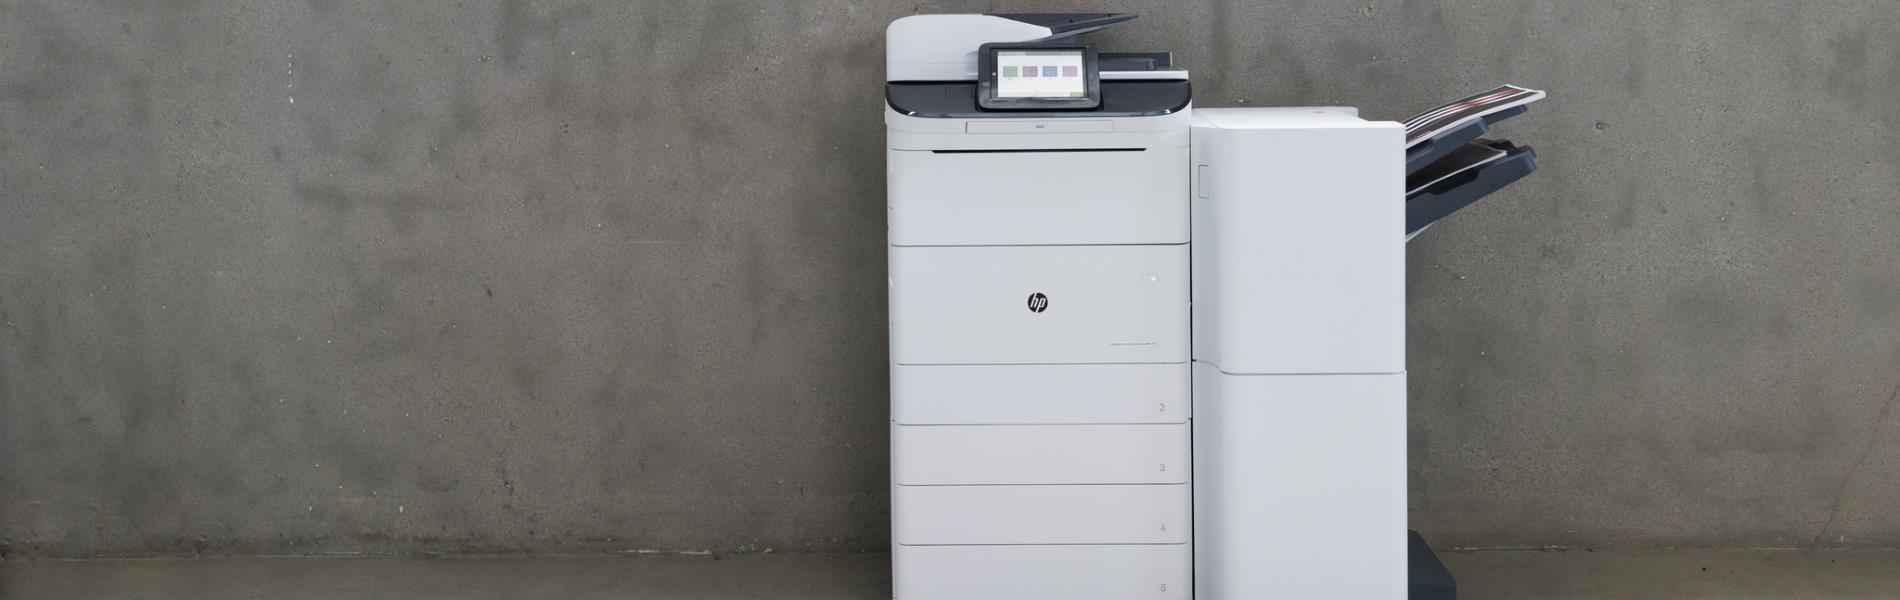 Print og Dokumentstyring